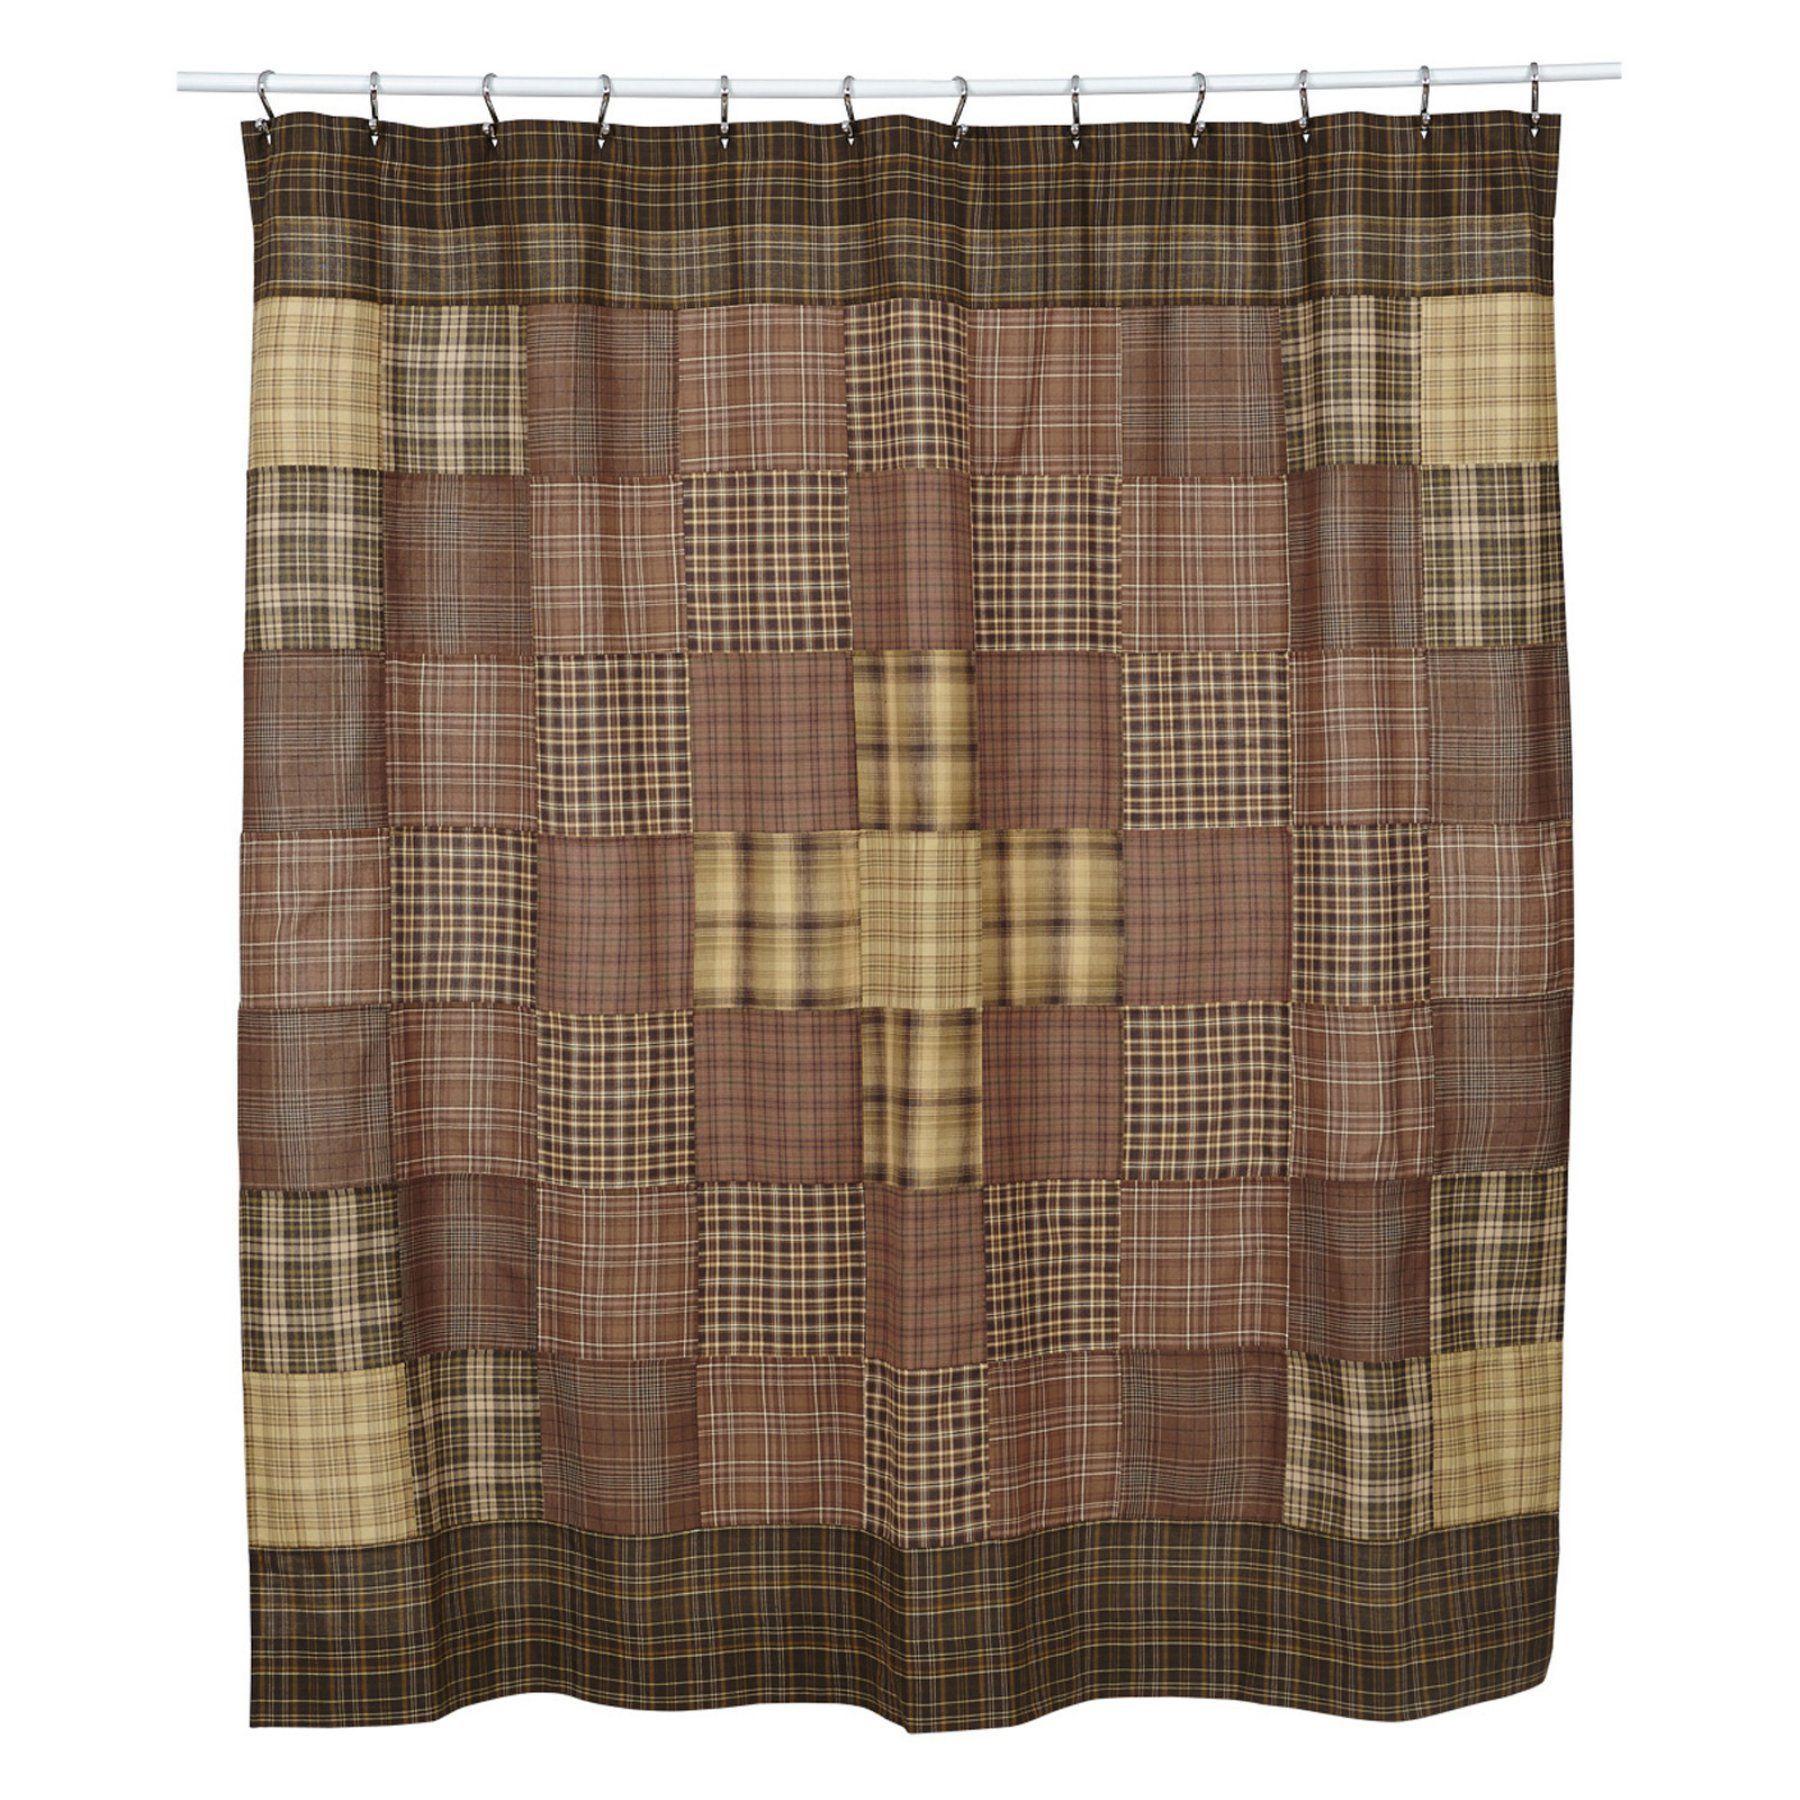 Vhc Prescott Unlined Shower Curtain 14968 Fabric Shower